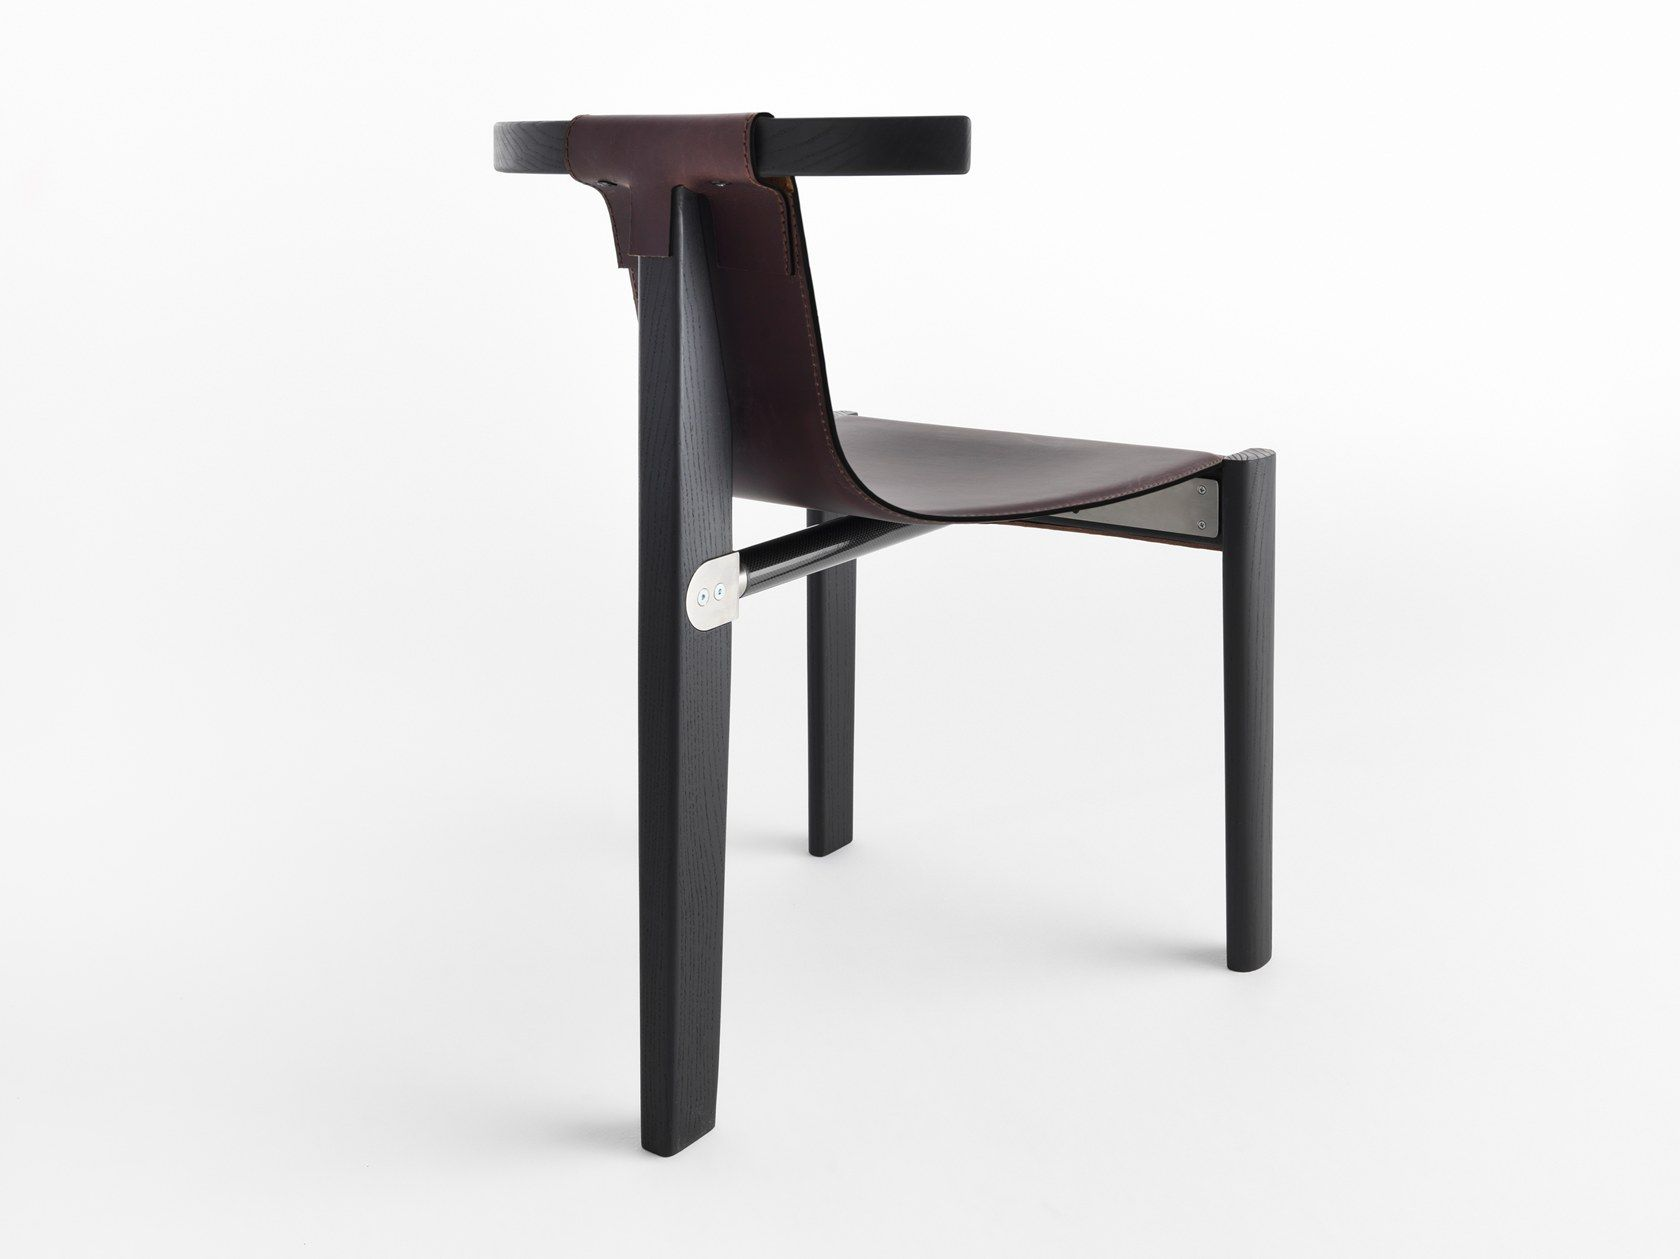 Ash Chair Pablita By Casamania Horm Design Marcello Pozzi